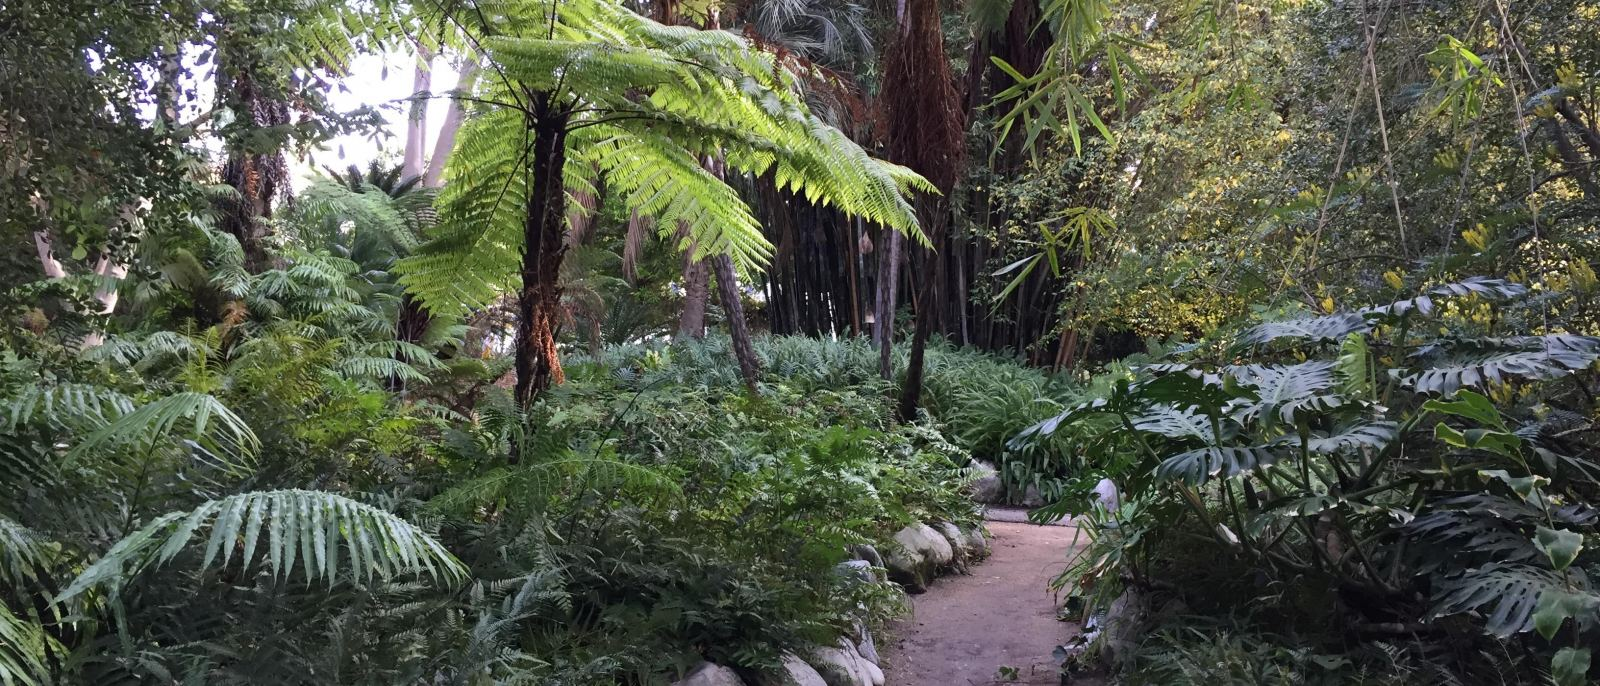 Mildred E. Mathias Botanical Garden at UCLA